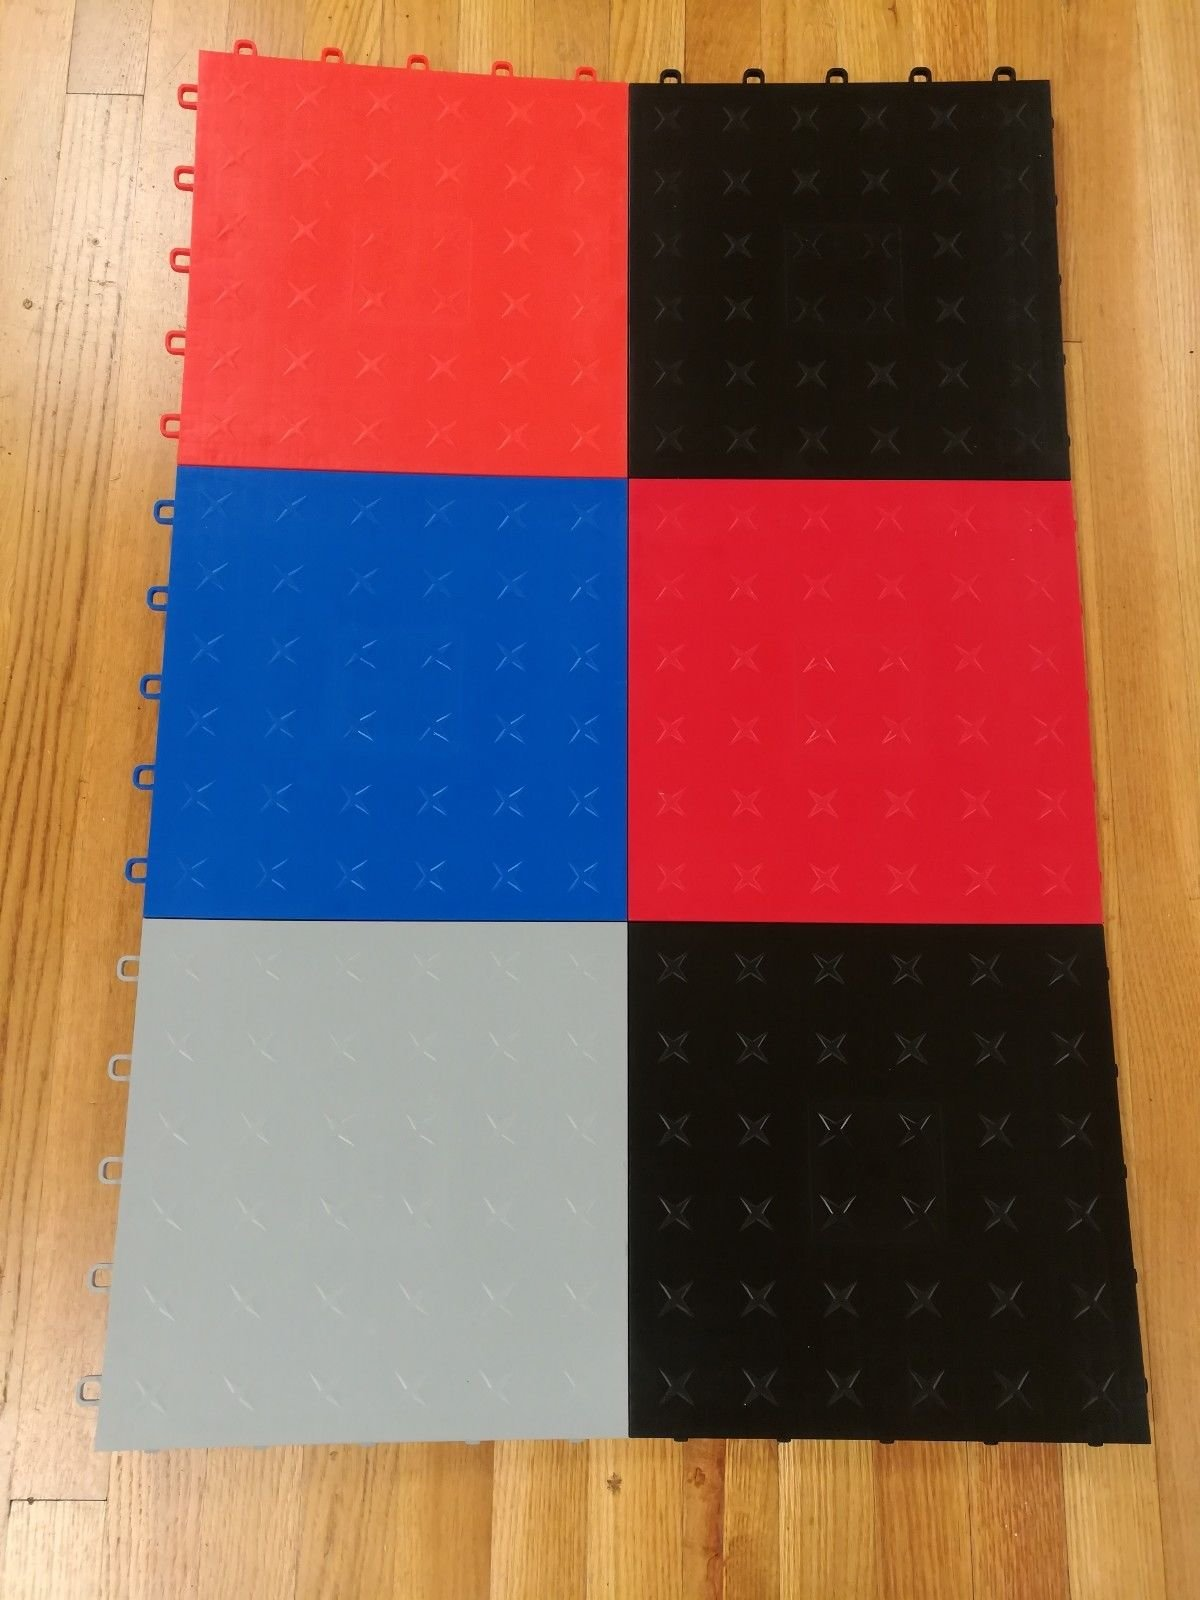 JSP Plastic Black Garage Tile Garage Floor Tiles Interlocking Basement Mat Black Diamond plate Made in USA (100) by JSP Manufacturing (Image #3)